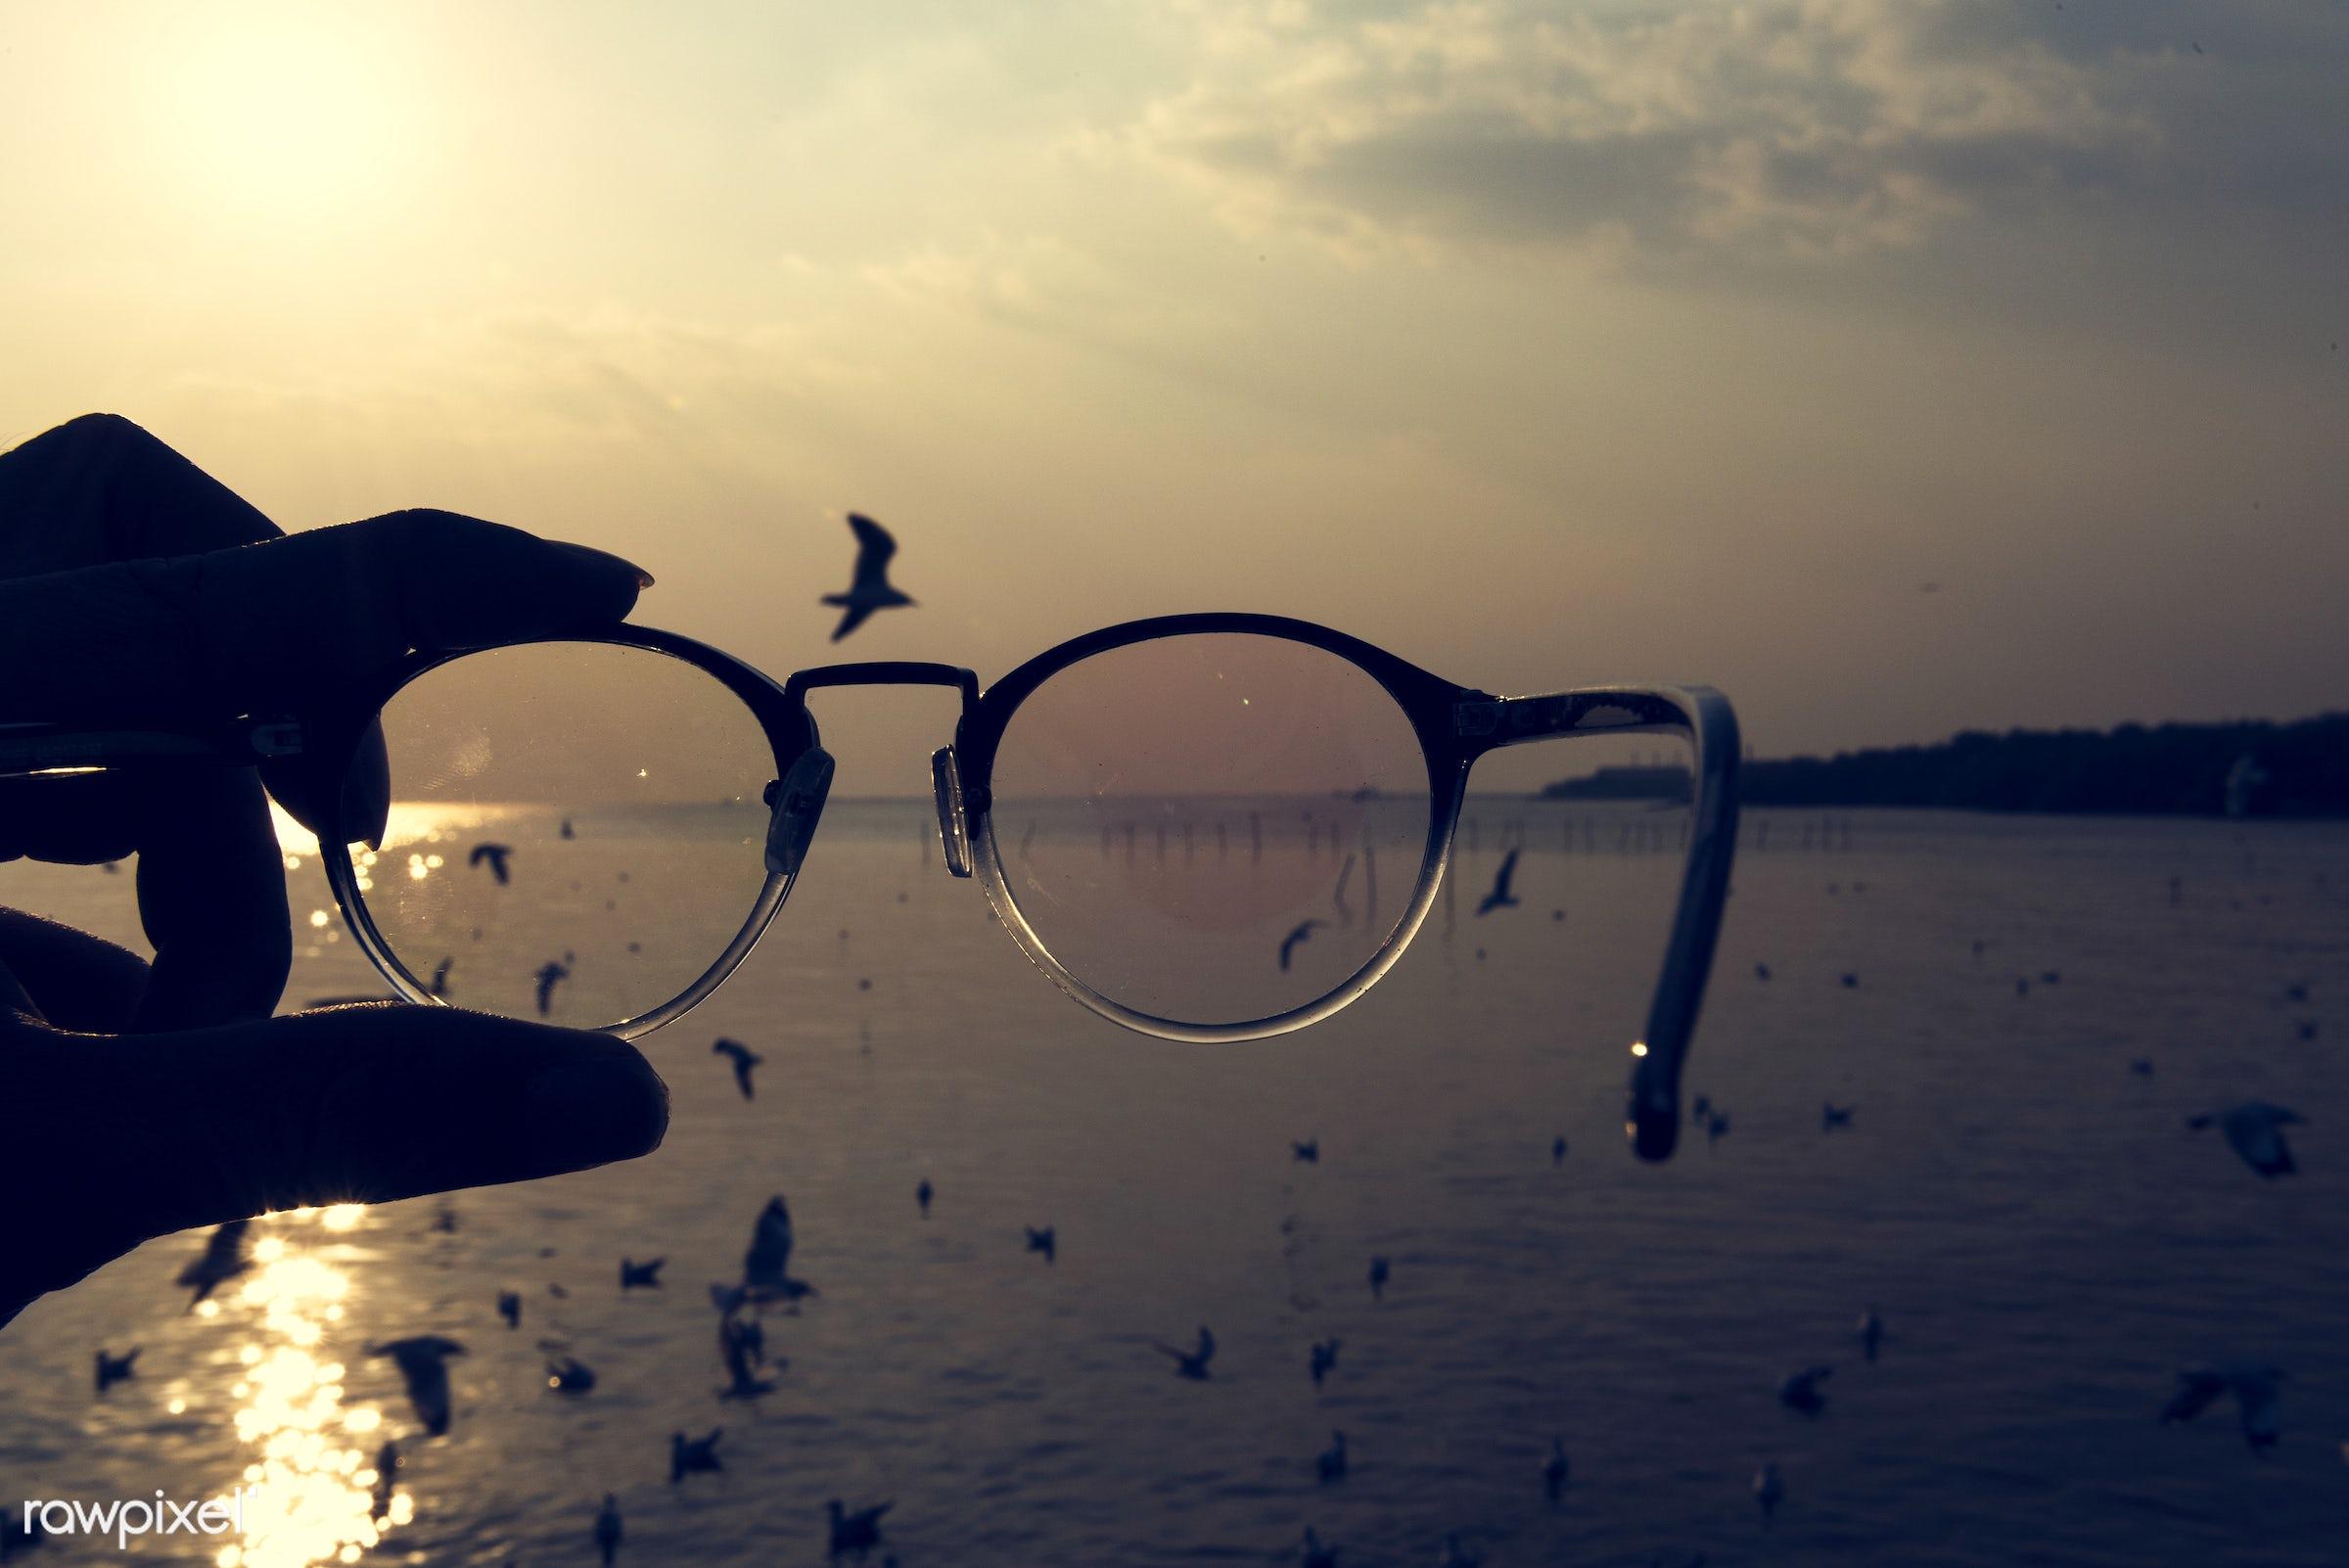 animal, bird, eyeglasses, fly, flying, glasses, hands, holding, migration, nature, ocean, outdoors, sea, sky, soar, sunset,...